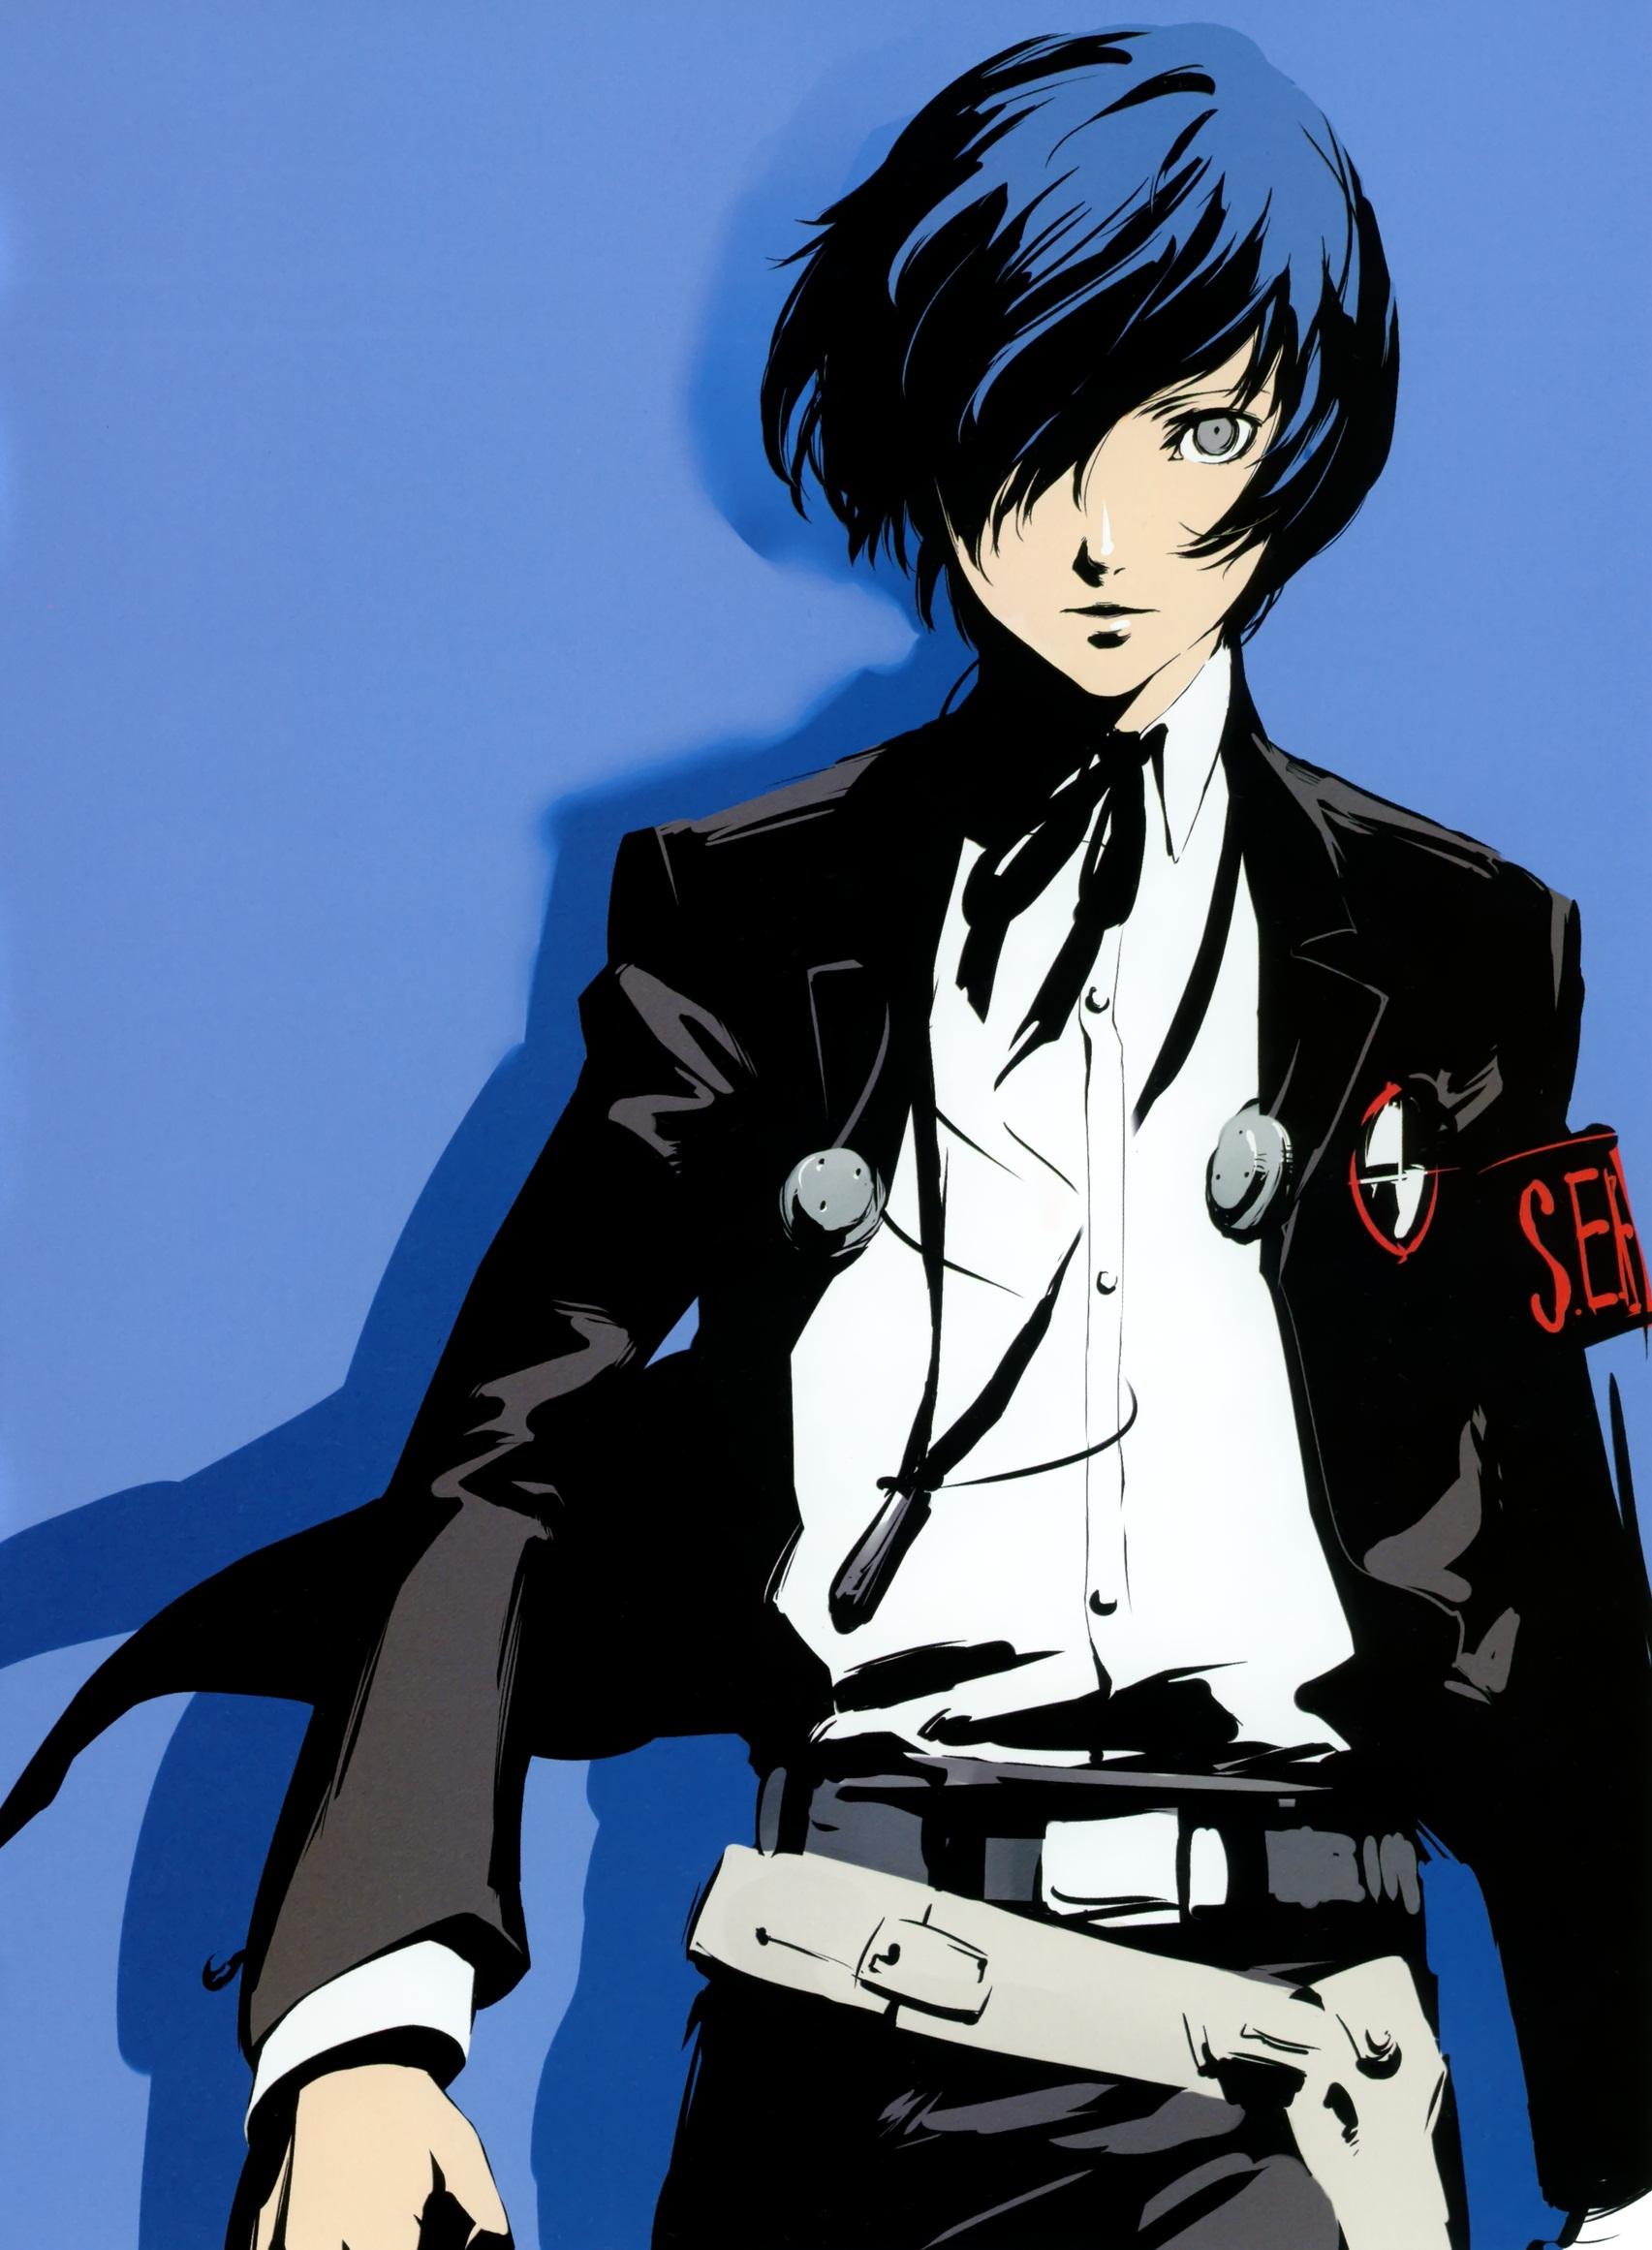 Persona 3 Protagonist 4